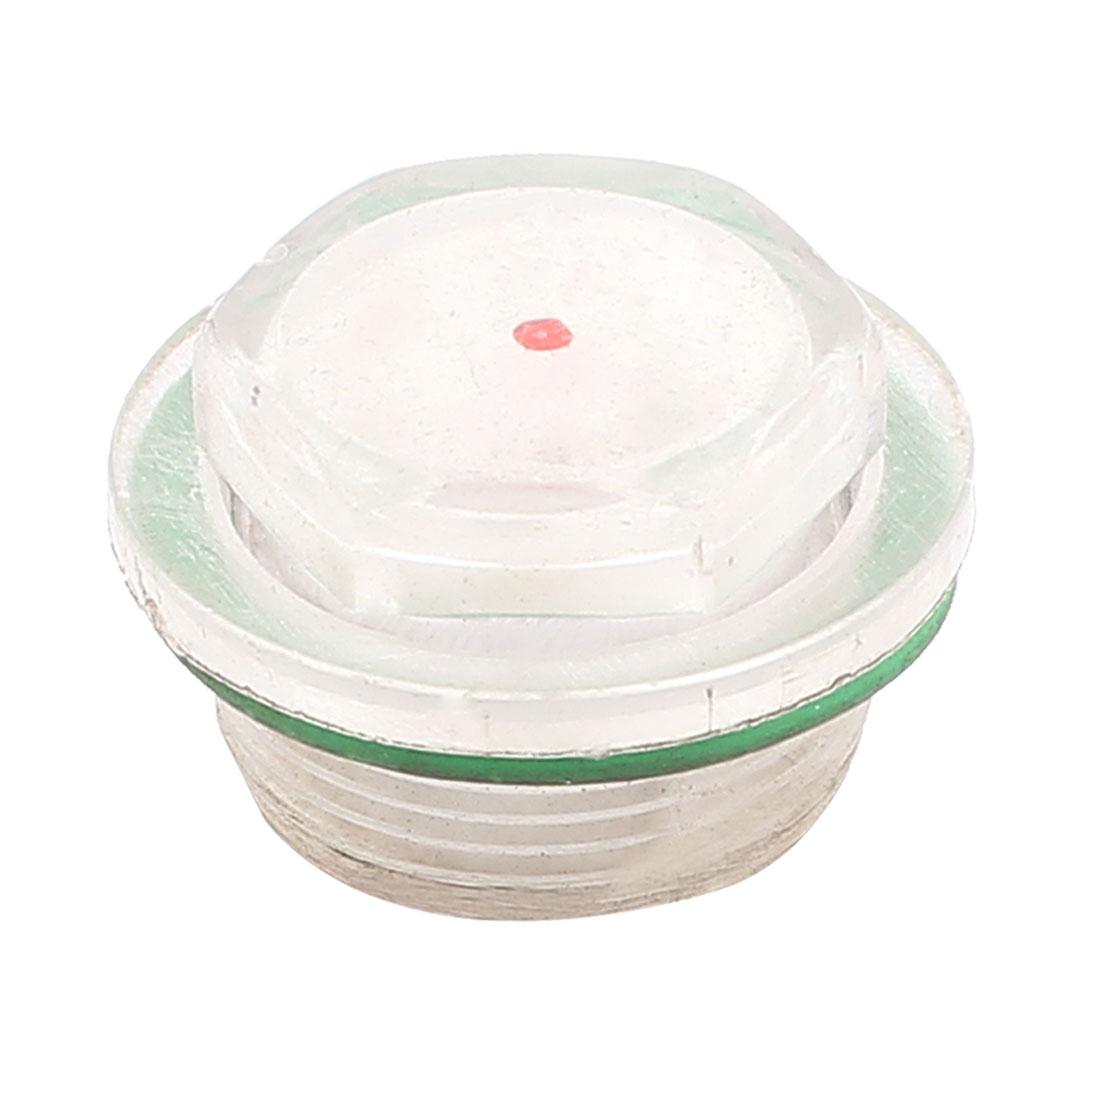 Air Compressor 26mm Thread Rubber Oil Liquid Level Sight Glass Indicator